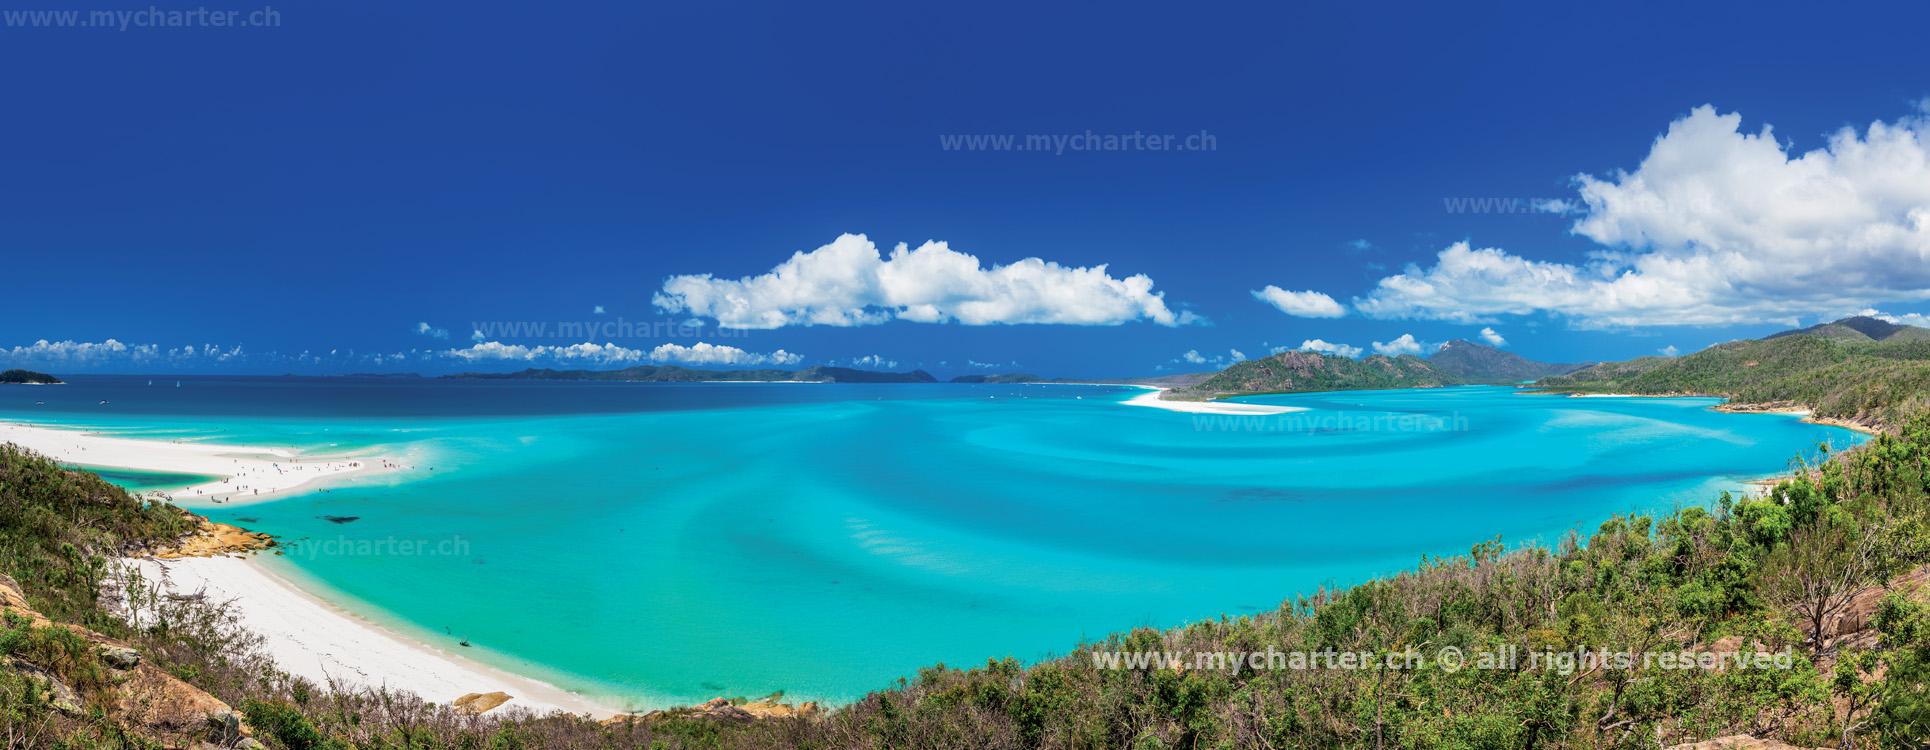 Yachtcharter Australien - Whiteheaven Beach